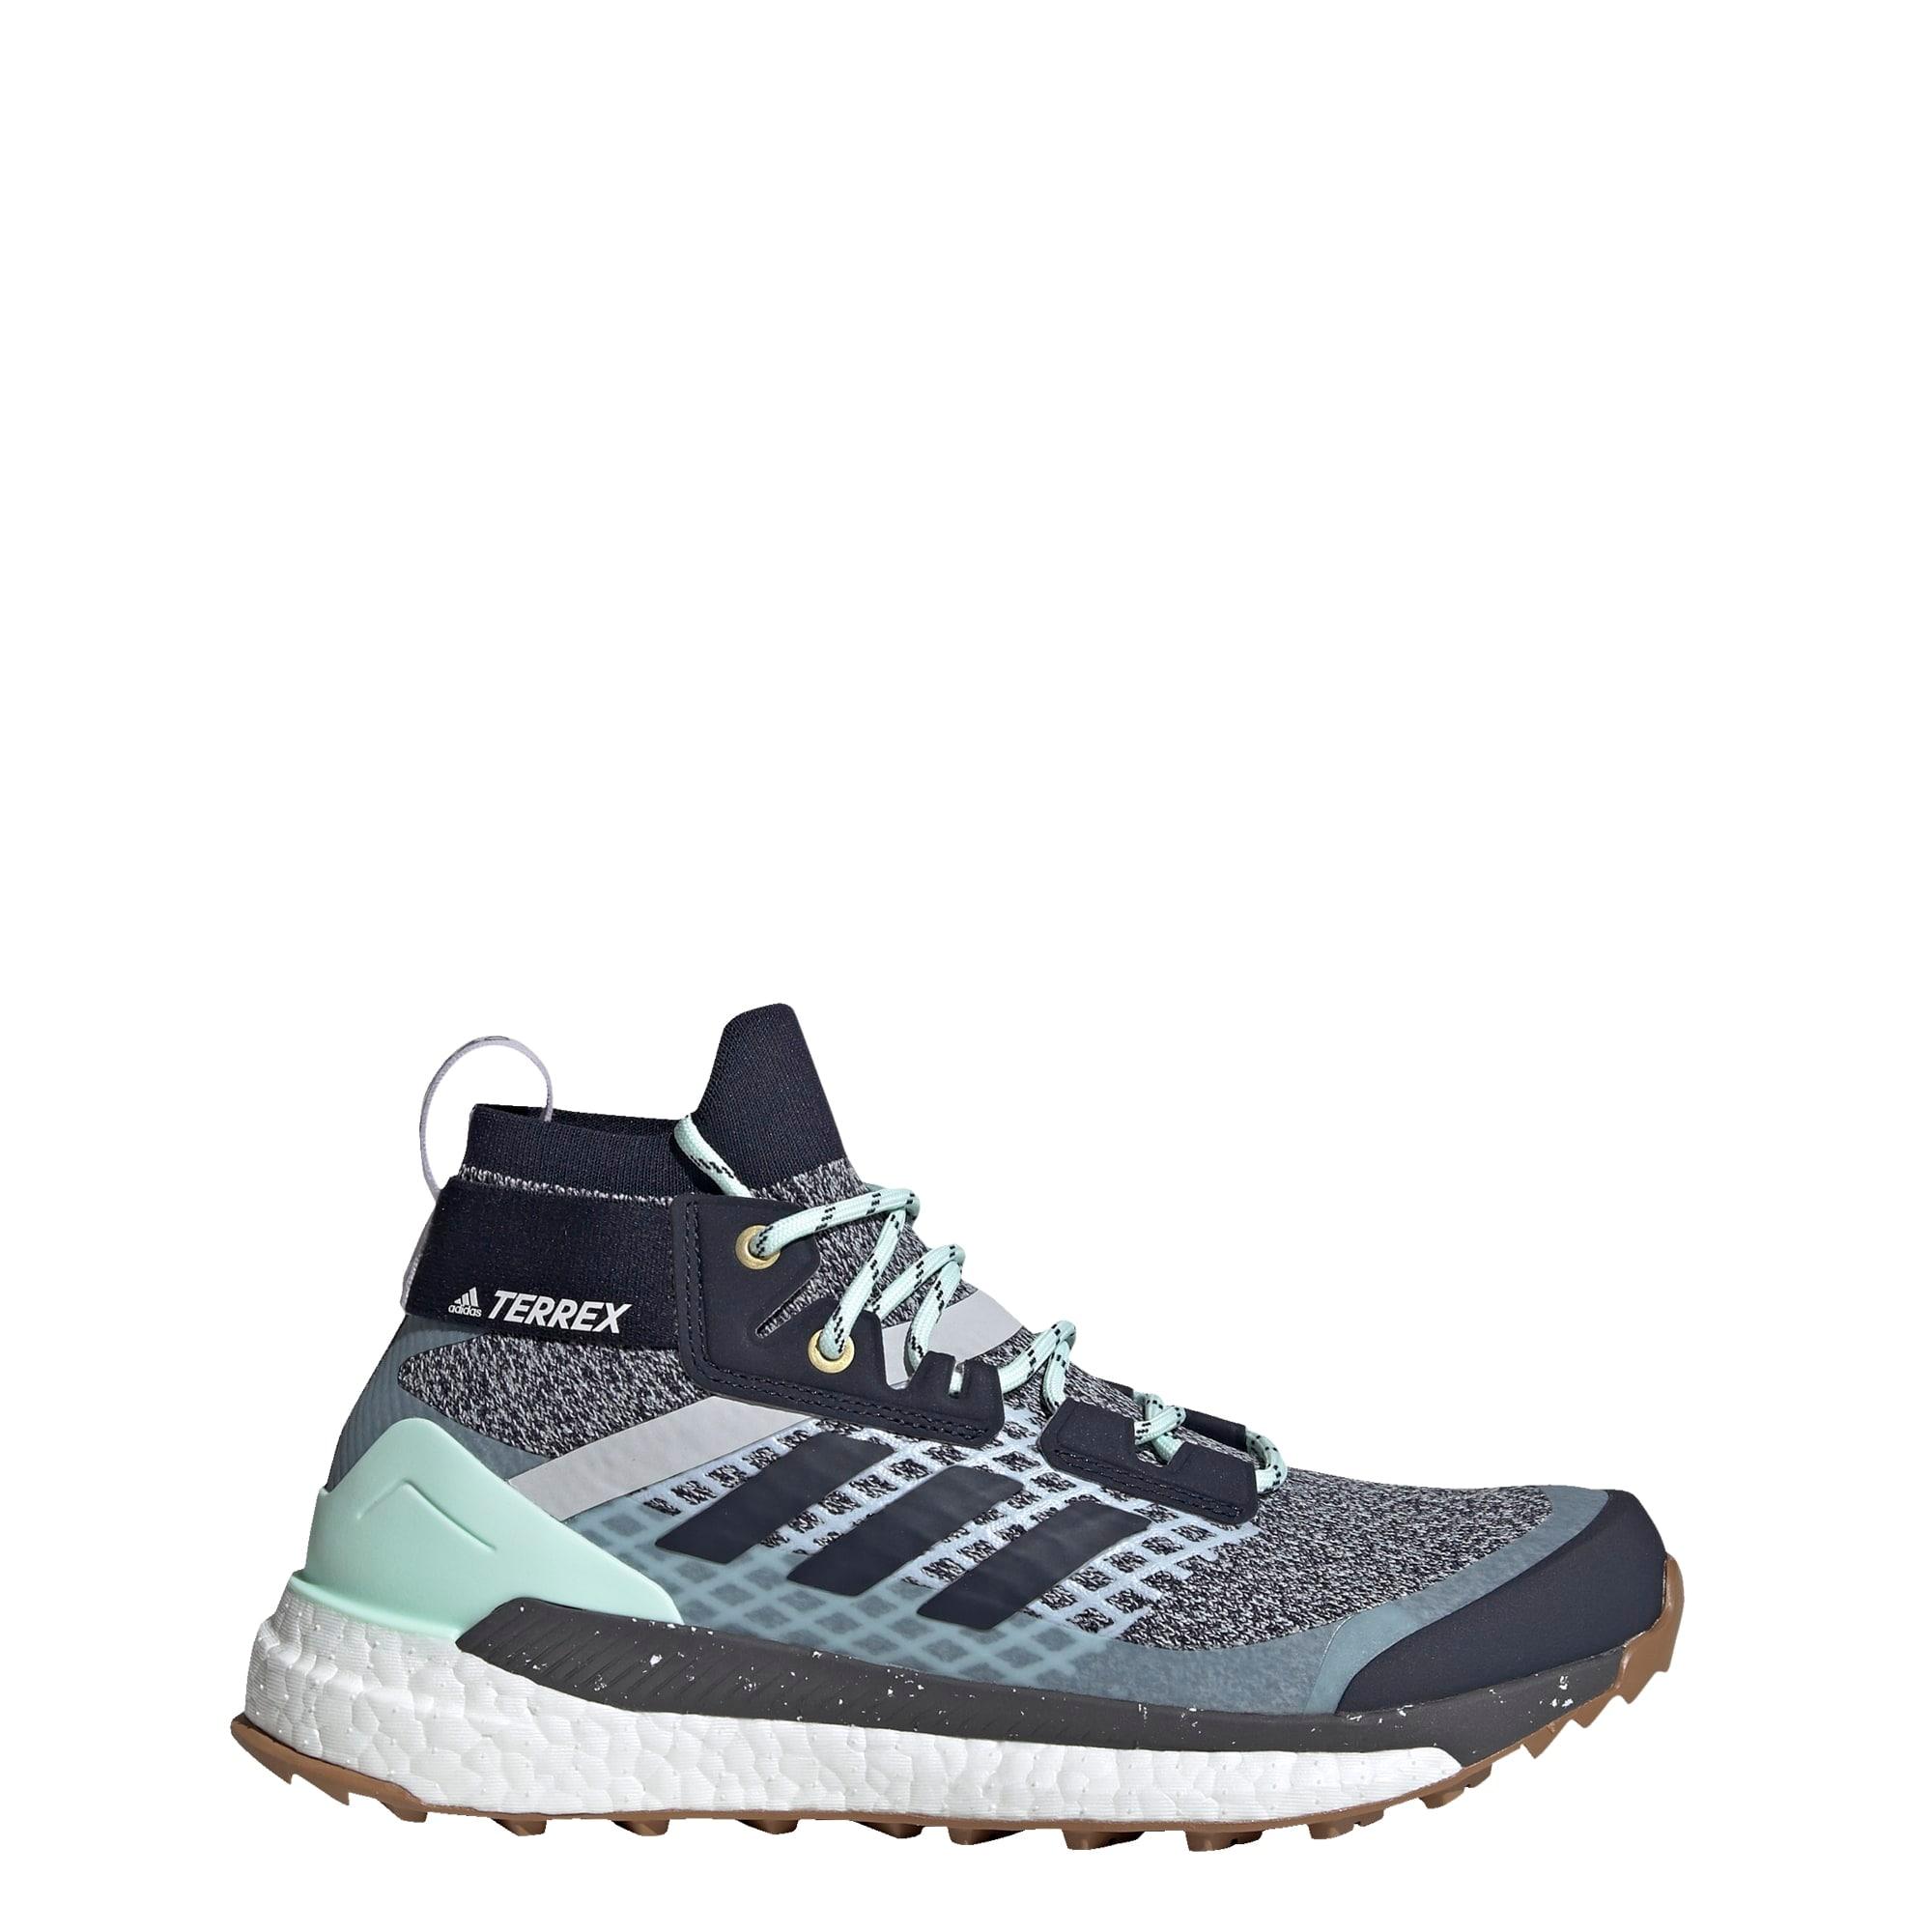 adidas performance - Wanderschuh 'Terrex Free Hiker'